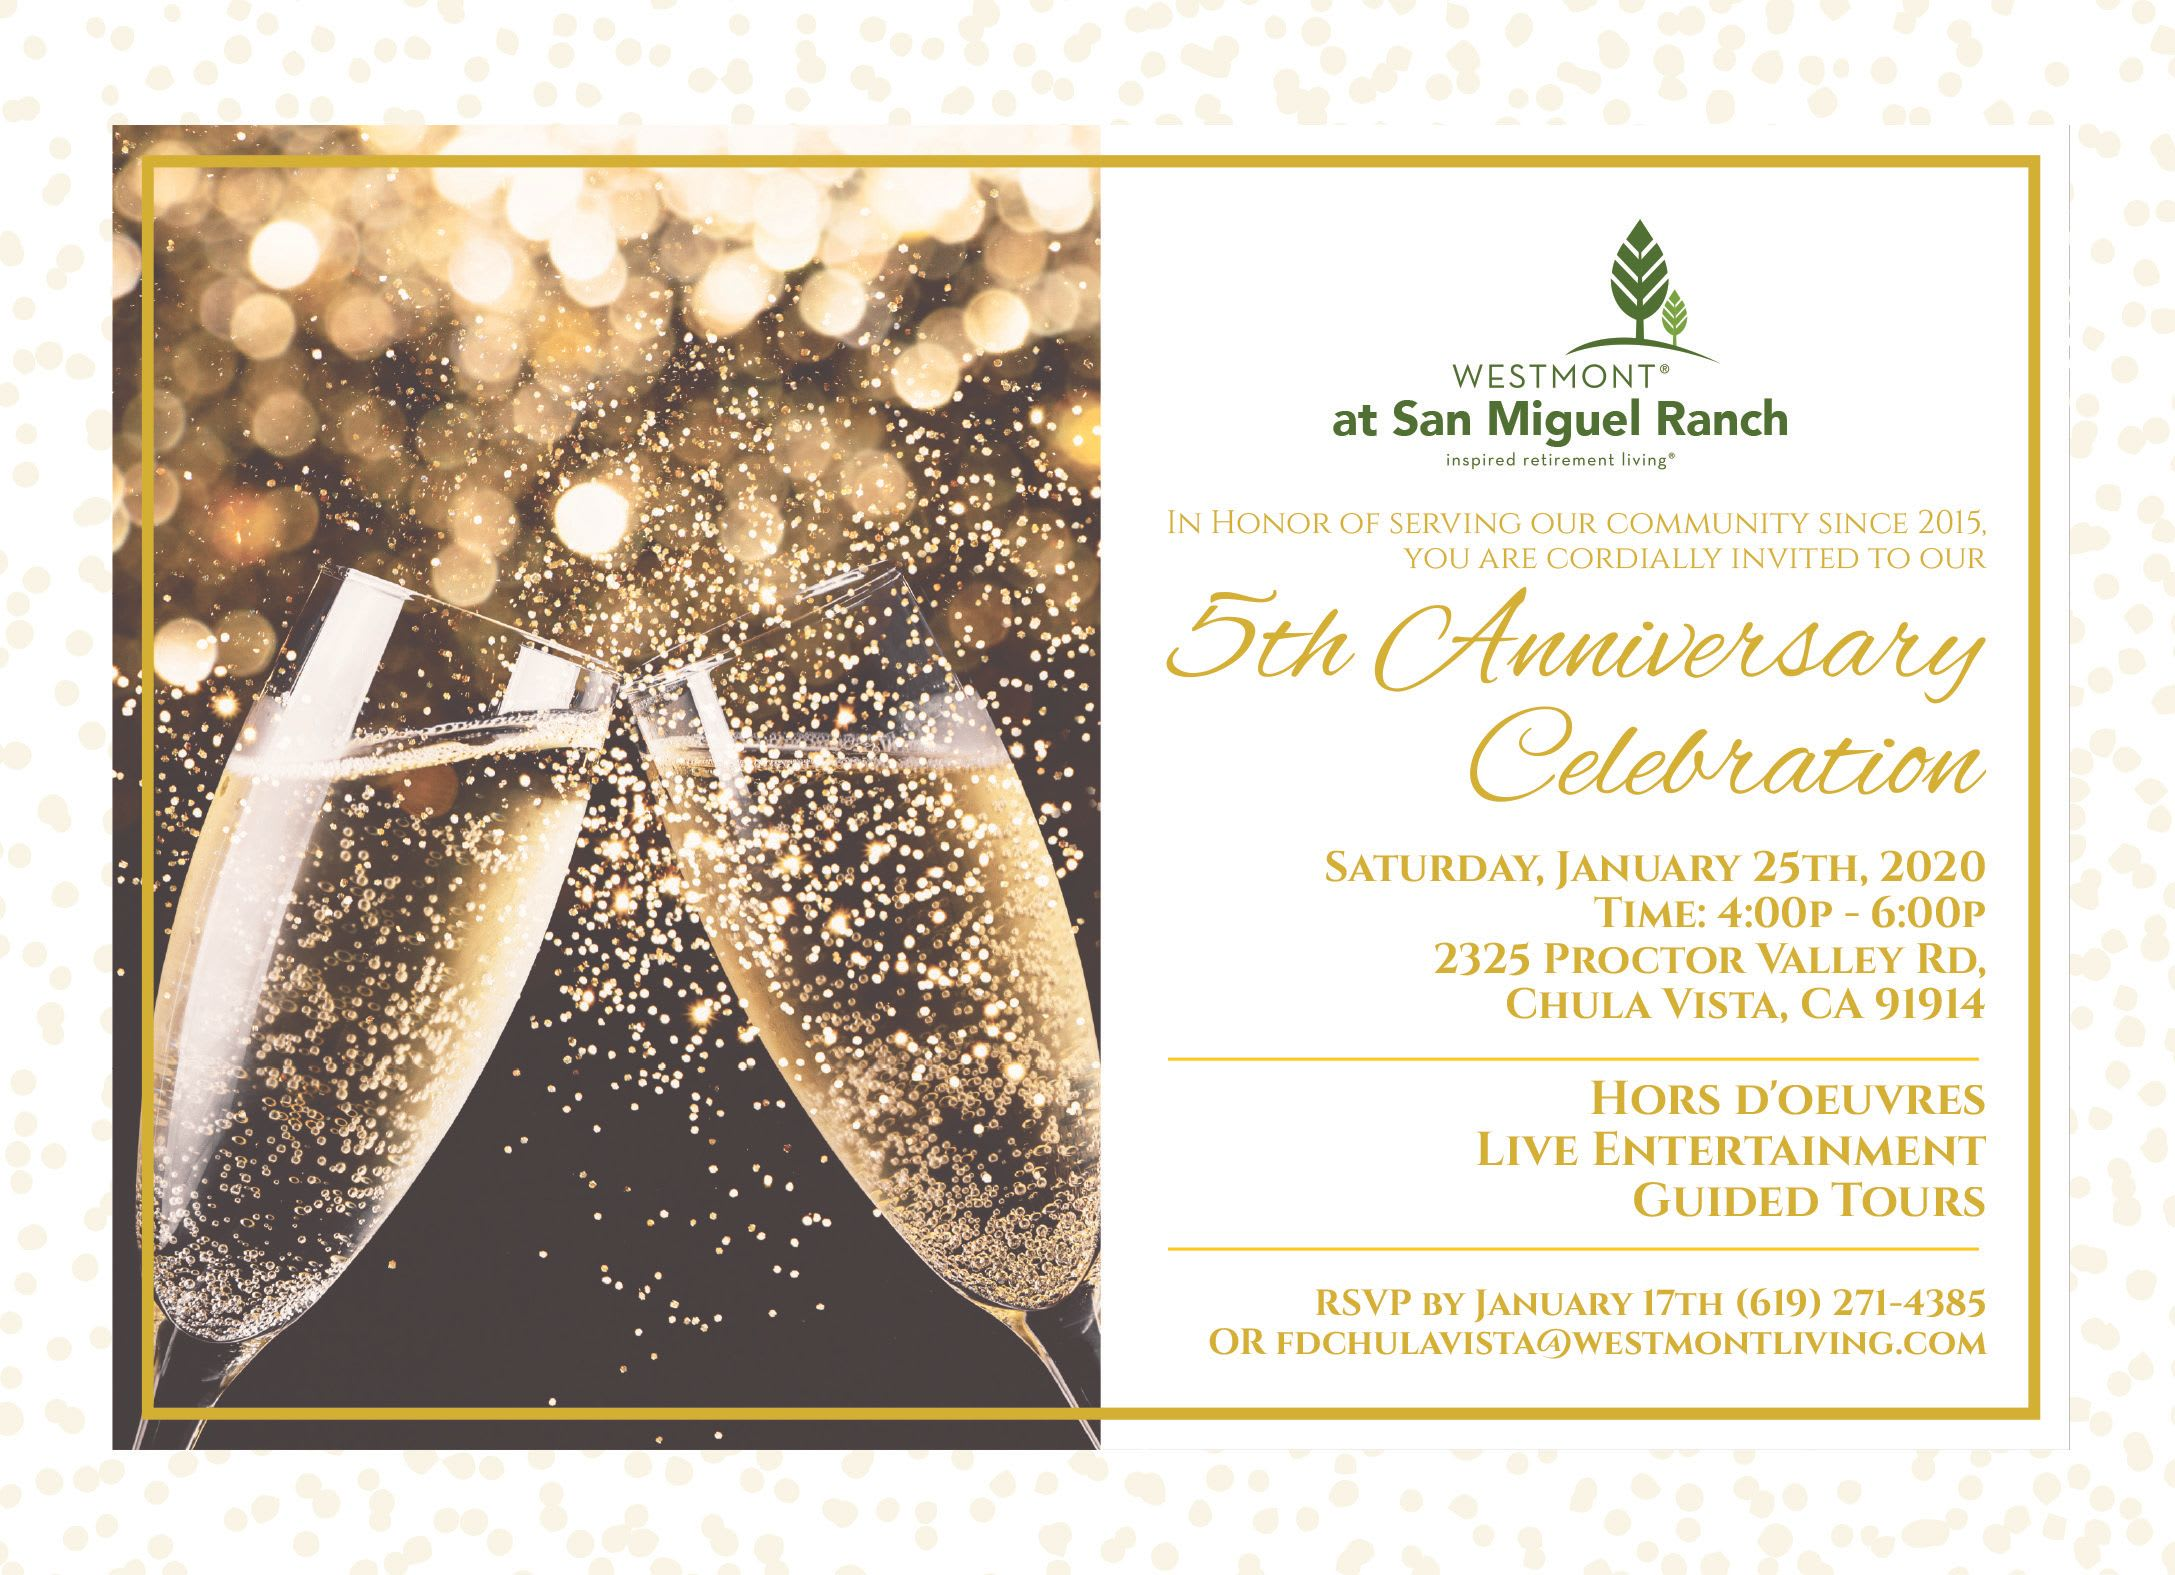 5th Anniversary Celebration